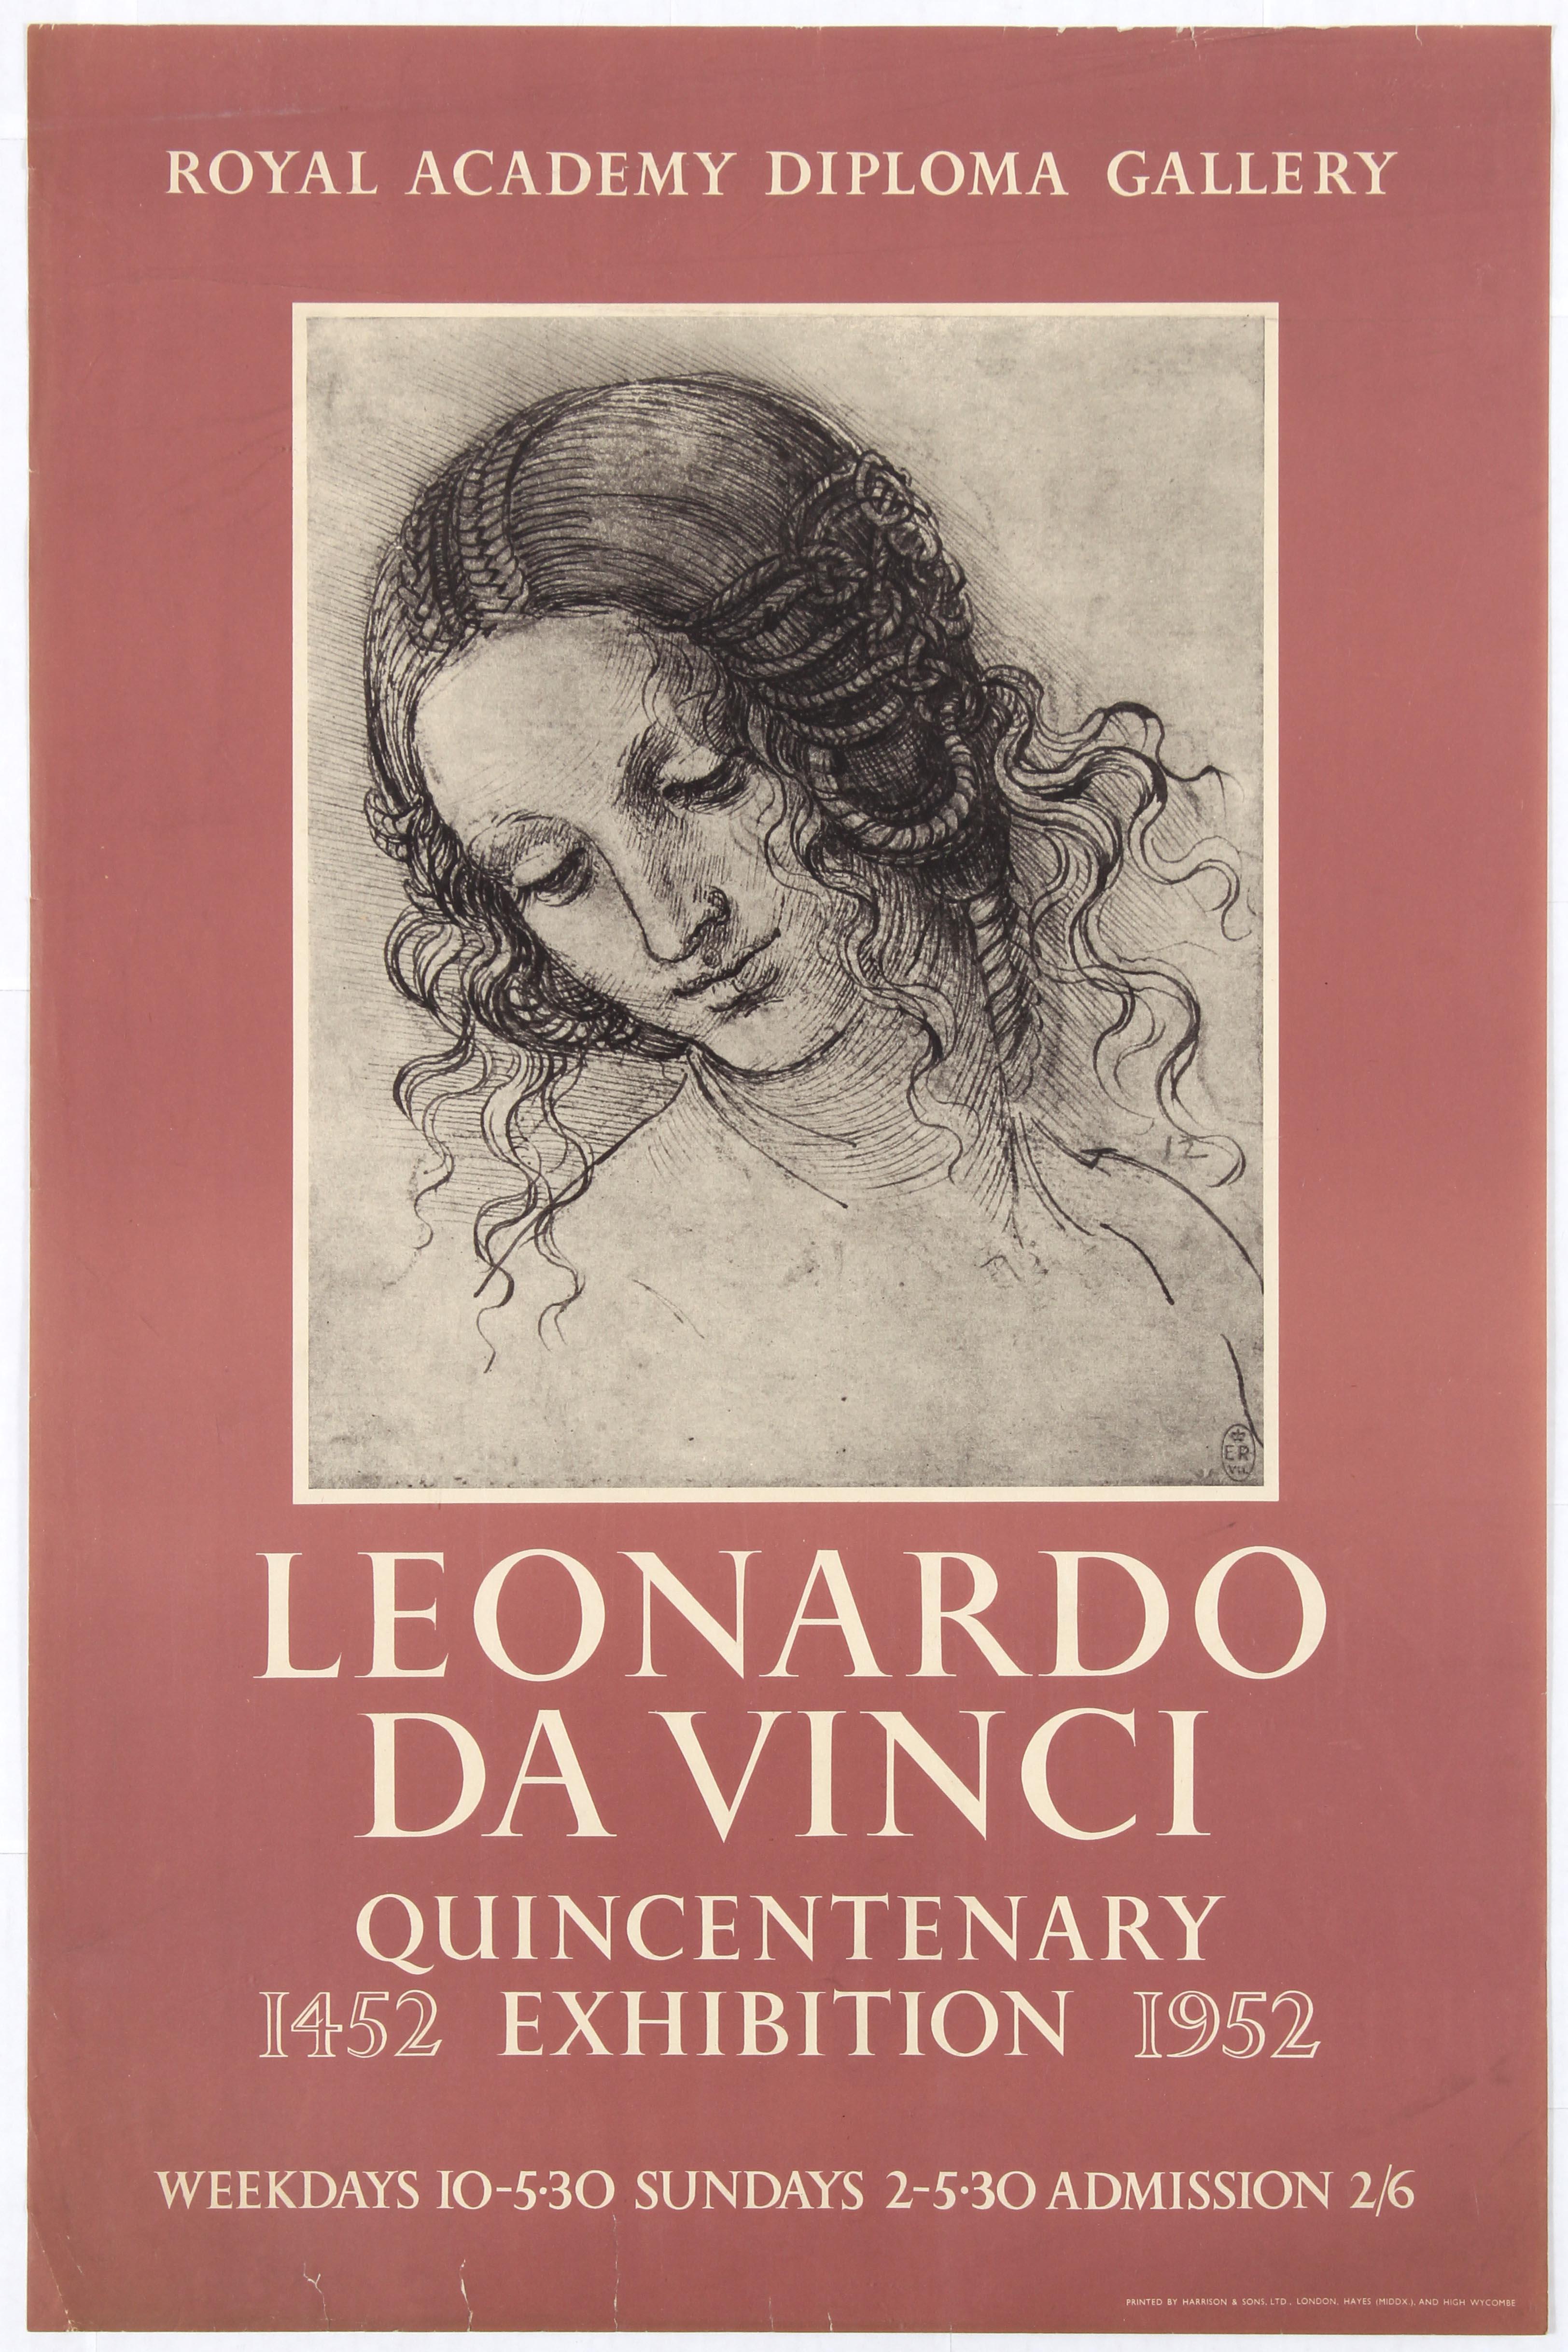 Lot 1504 - Advertising Poster Royal Academy Diploma Gallery Leonardo Da Vinci